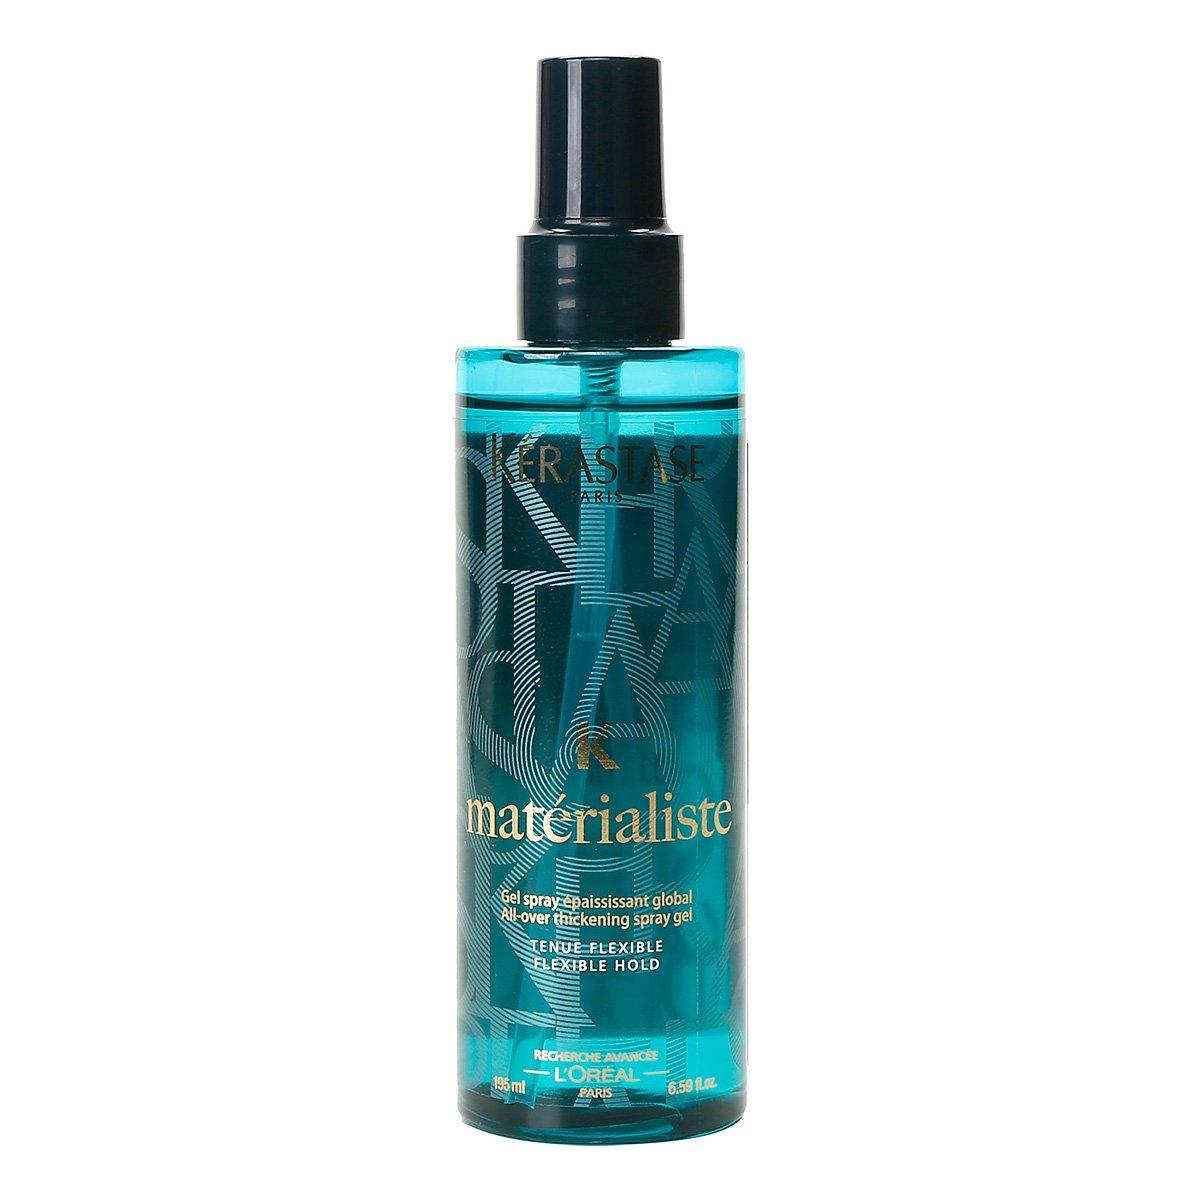 Kerastase Couture Styling - Spray gel Matérialiste - 195ml